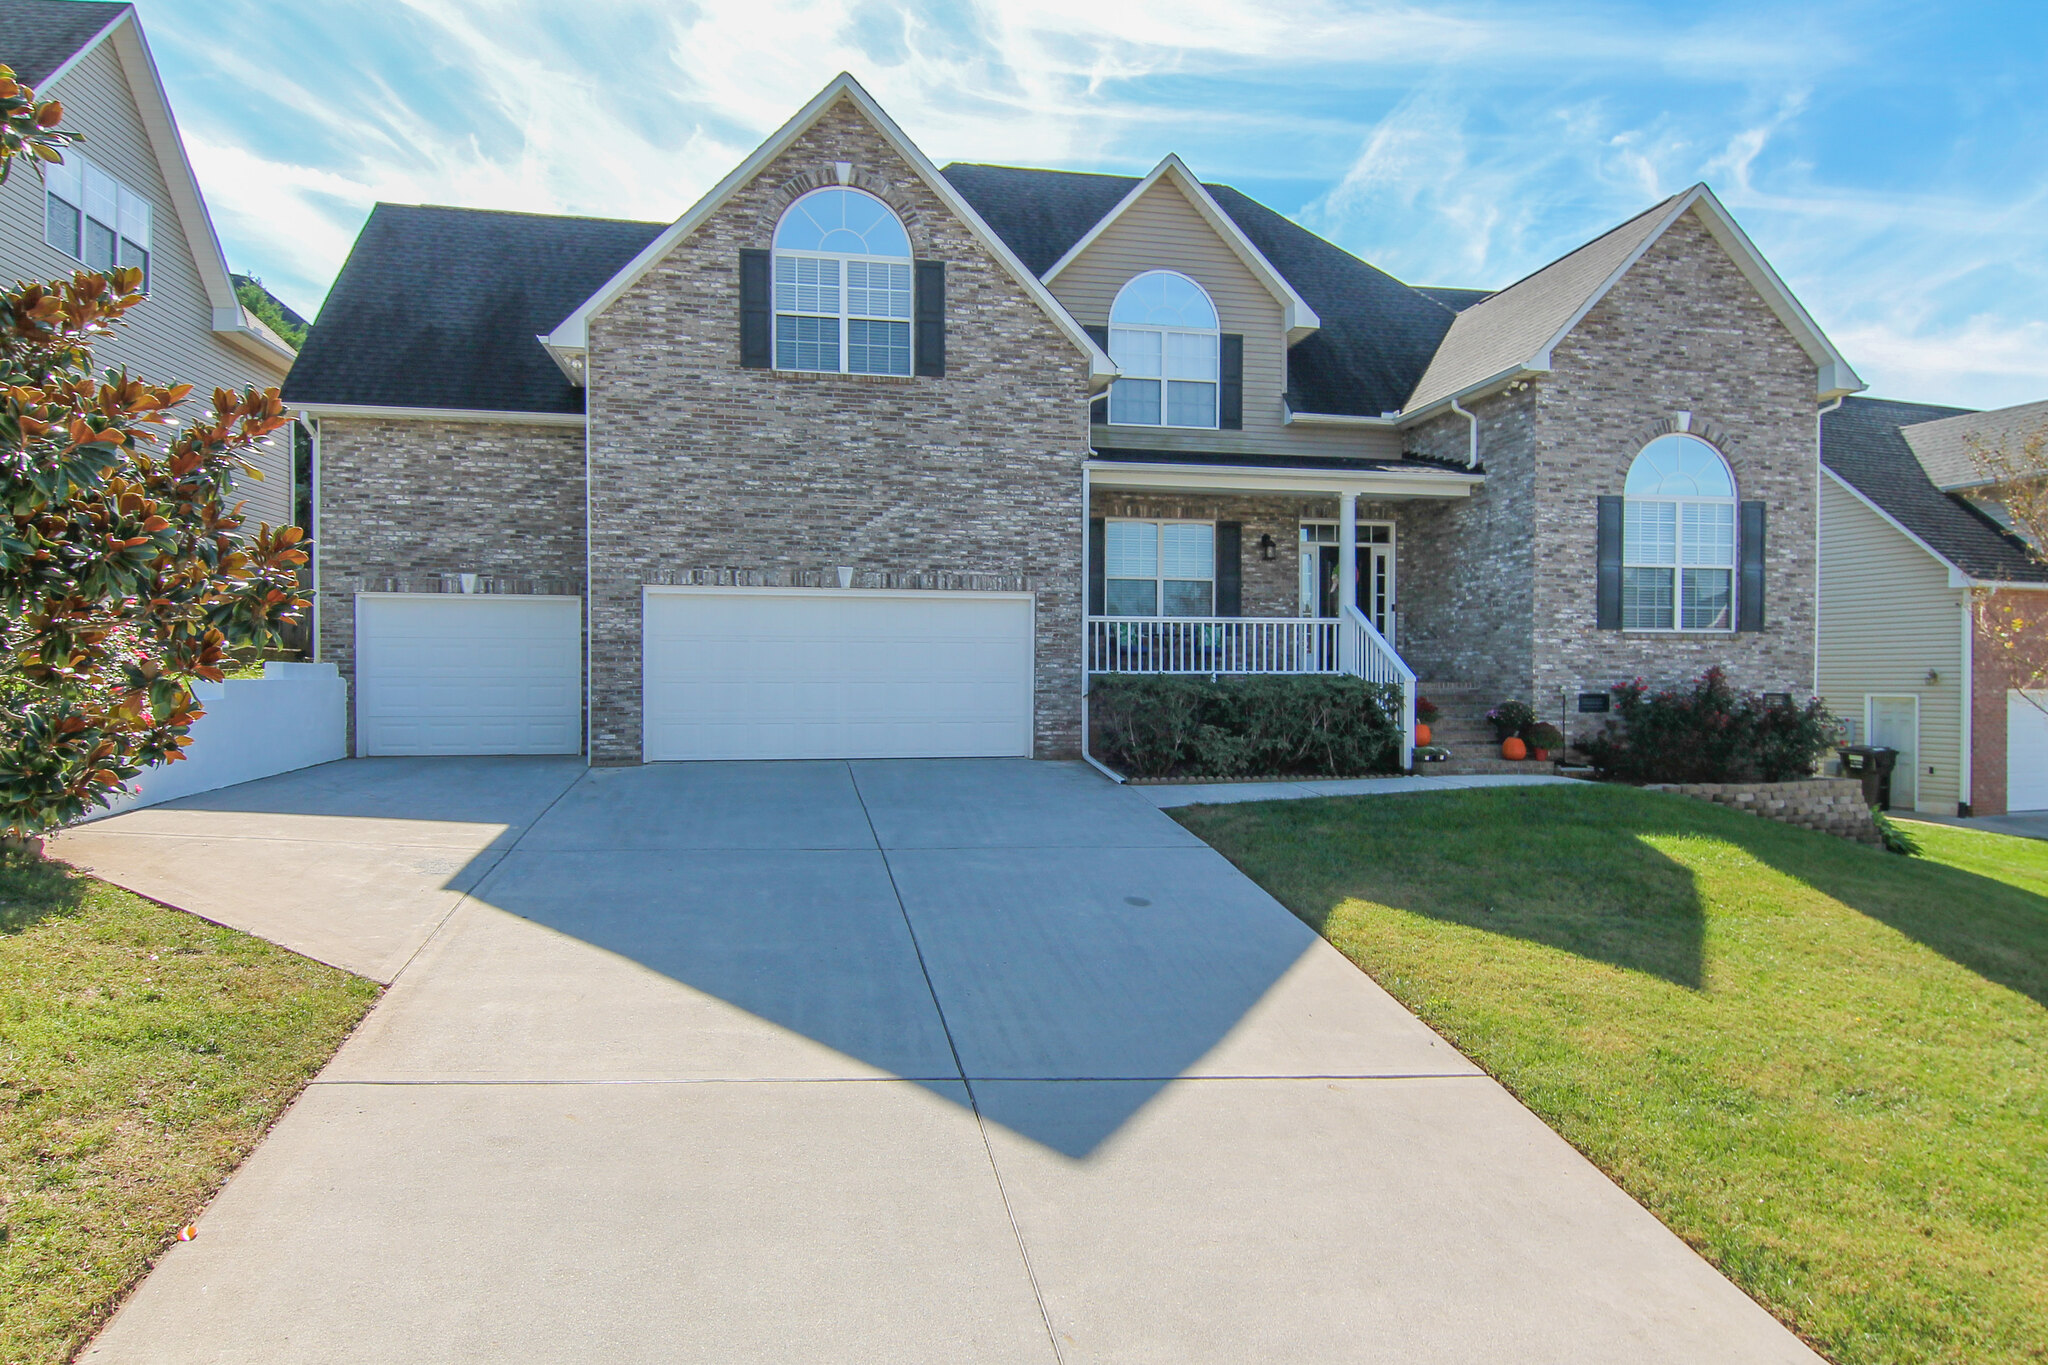 12938 Clear Ridge, Knoxville, TN 37922